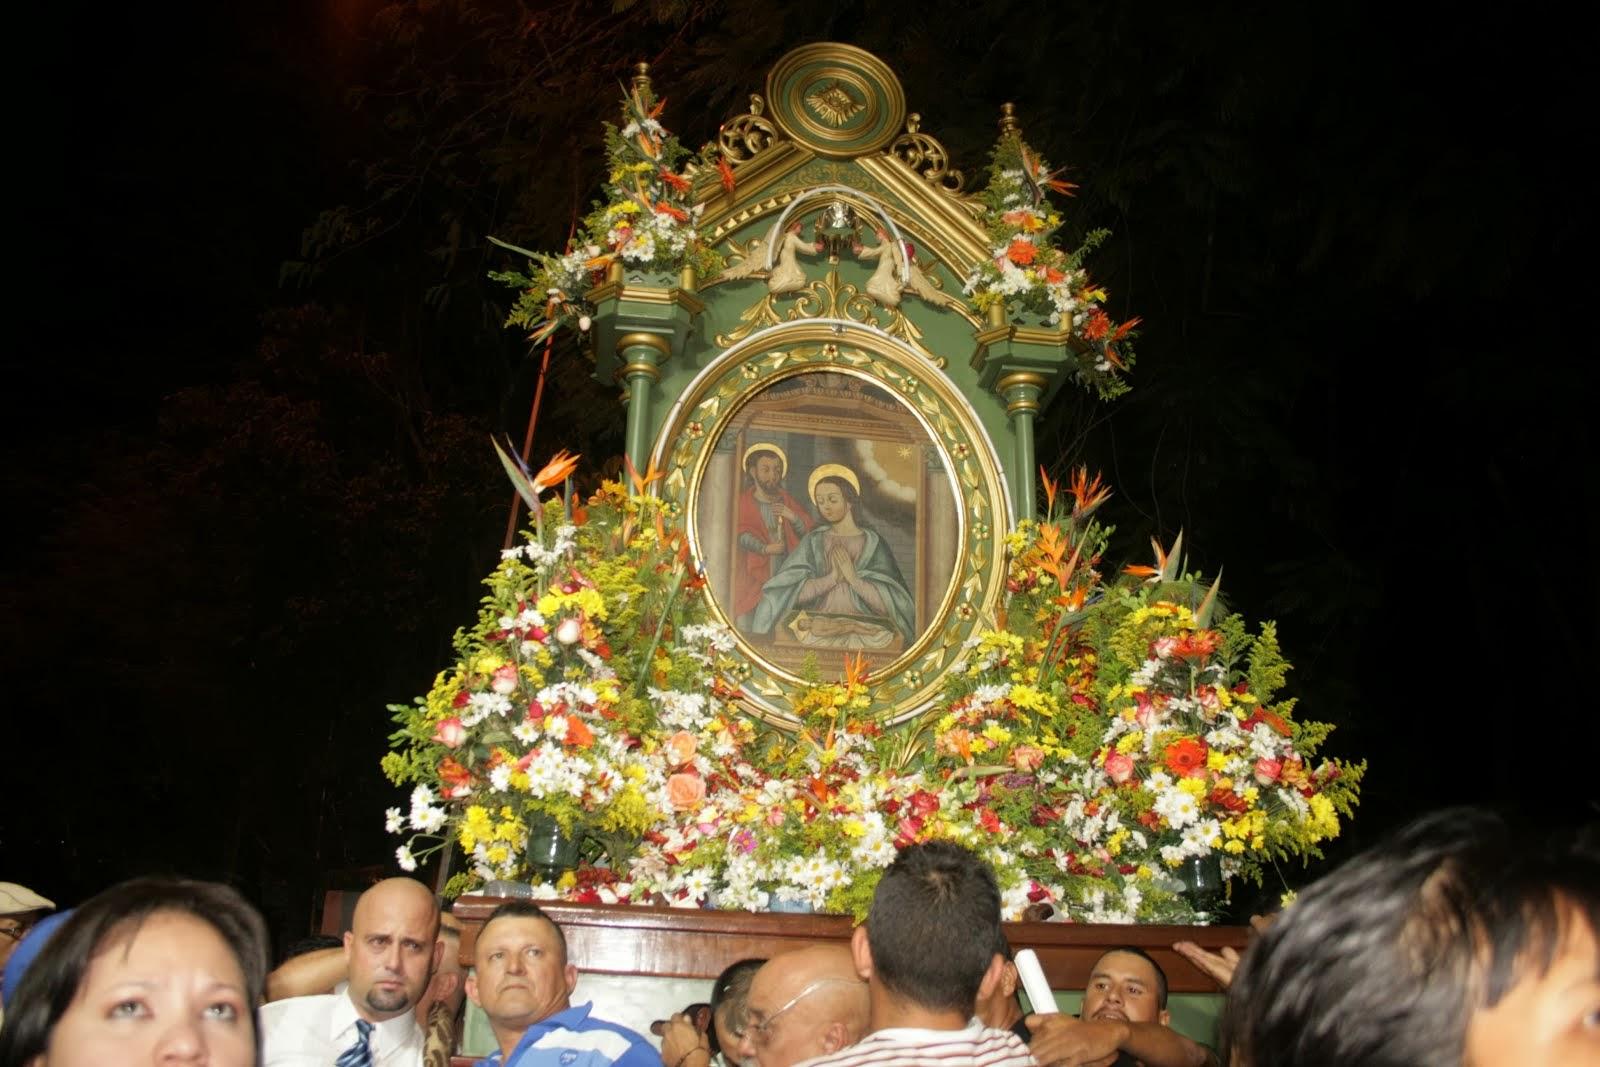 Virgen de Altagracia